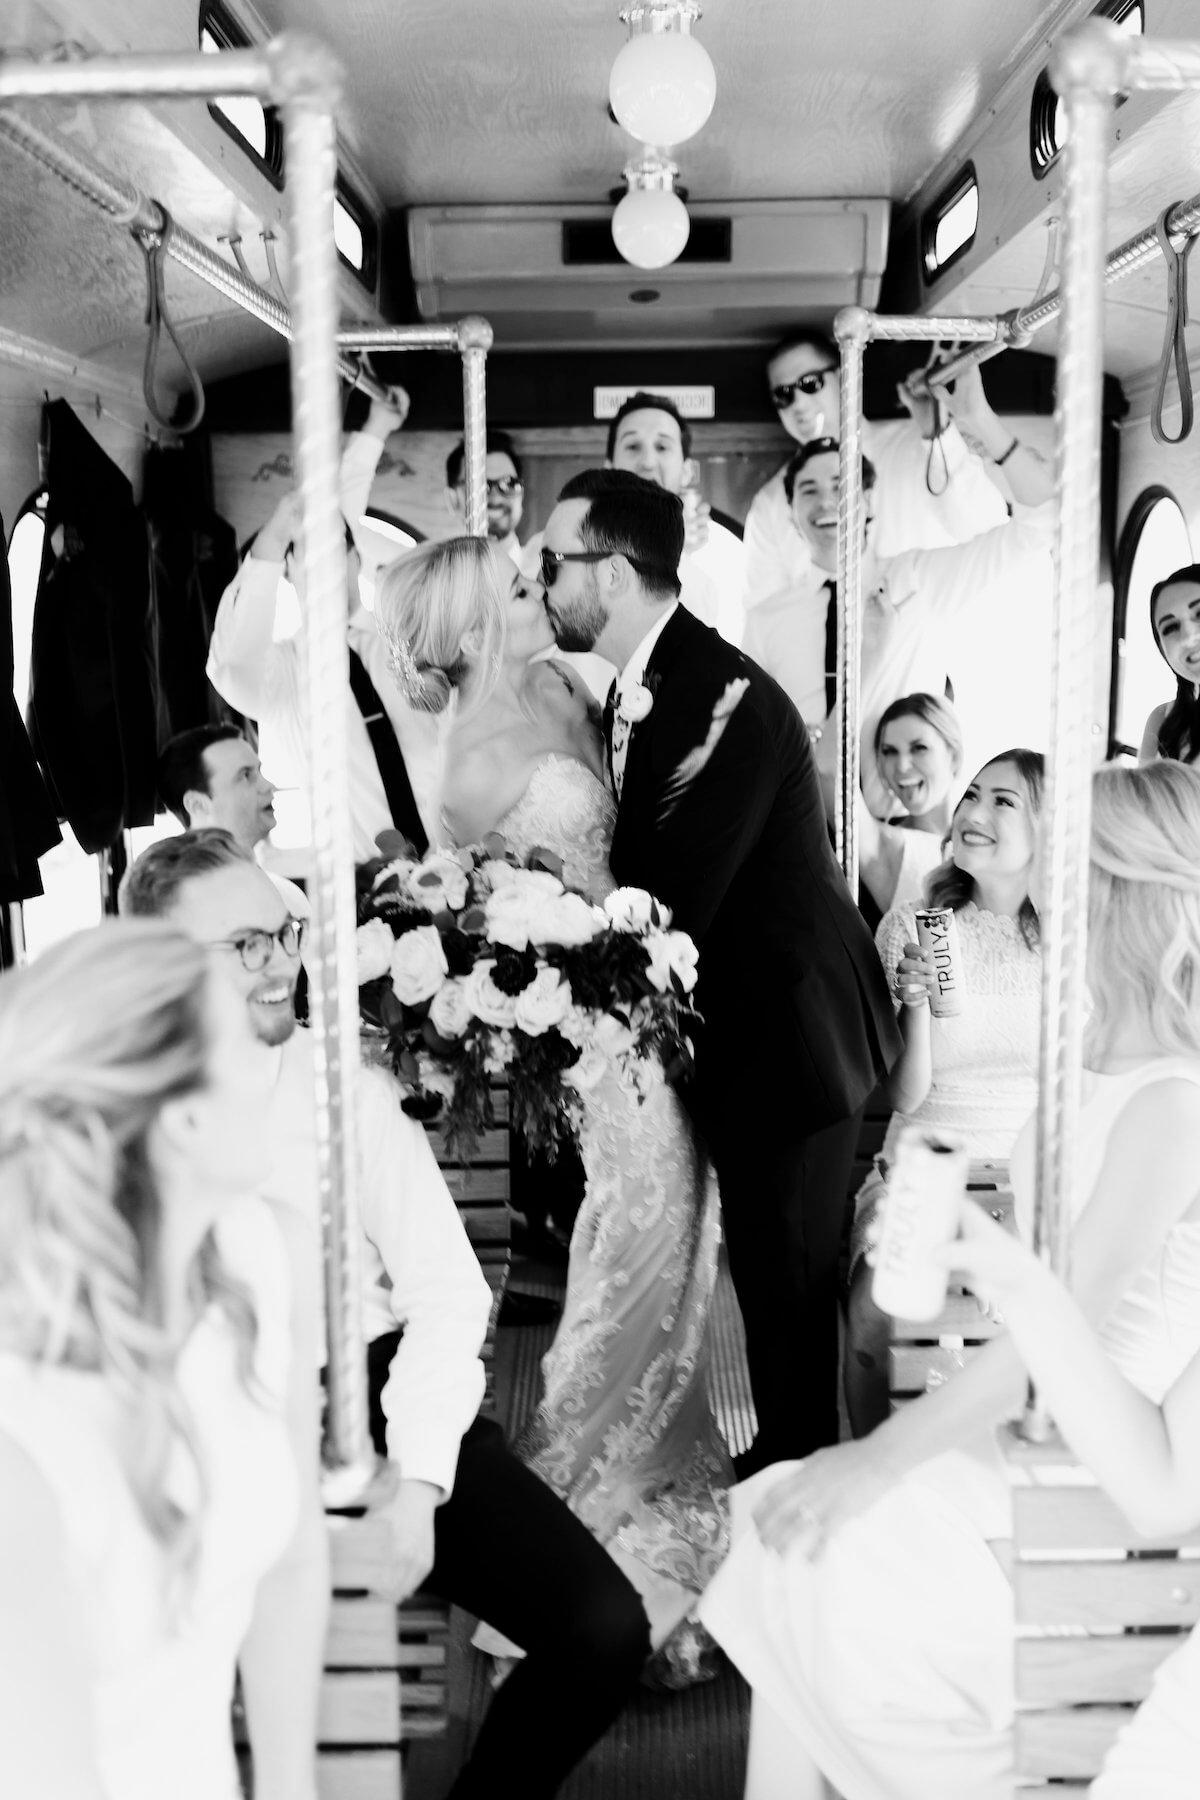 engle-olson-april-cj-wedding-jessica-holleque-6.jpg